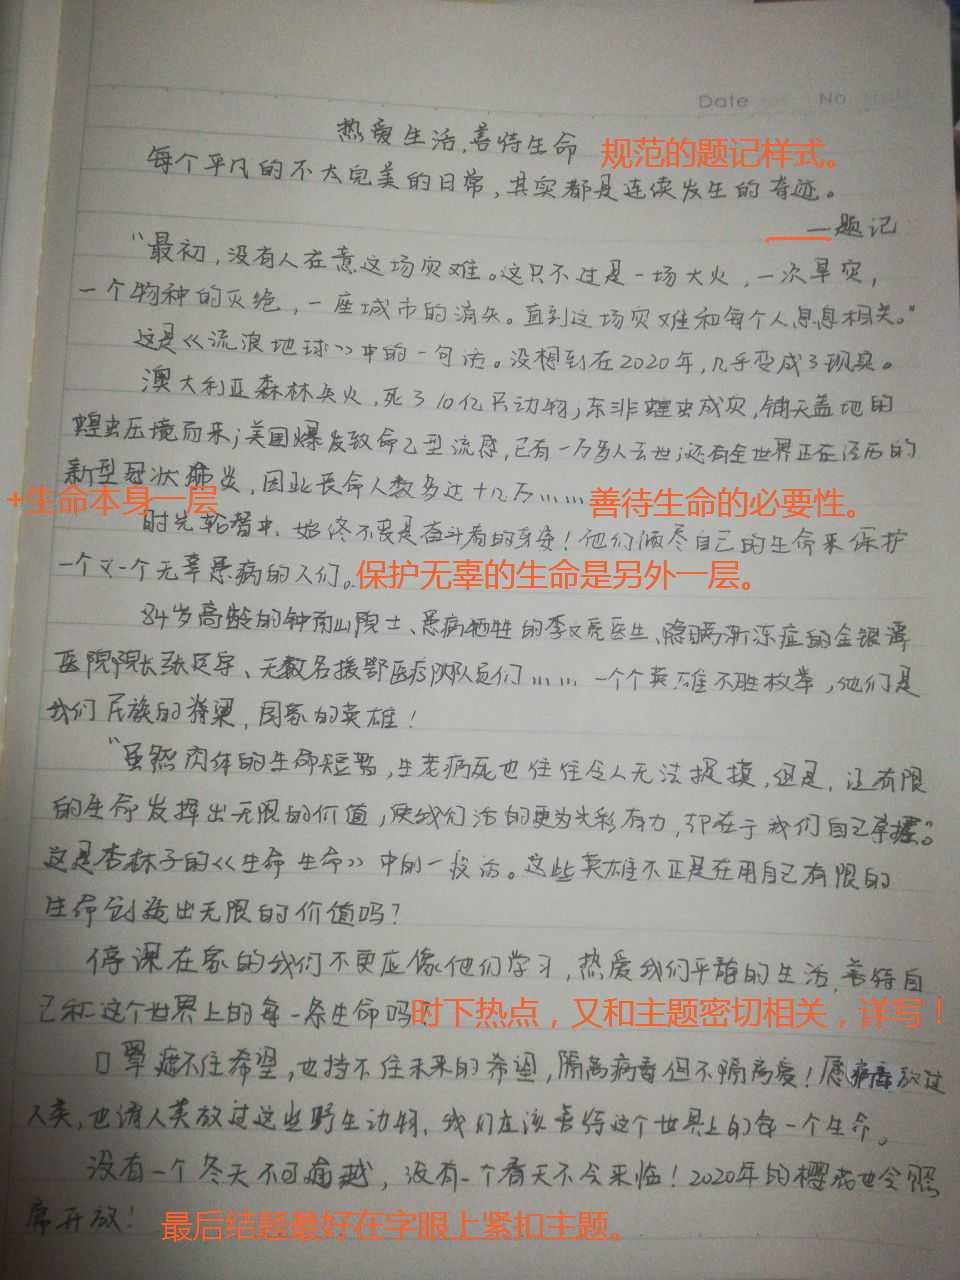 C:\Users\Administrator\Desktop\优秀作文\刘子萌.png